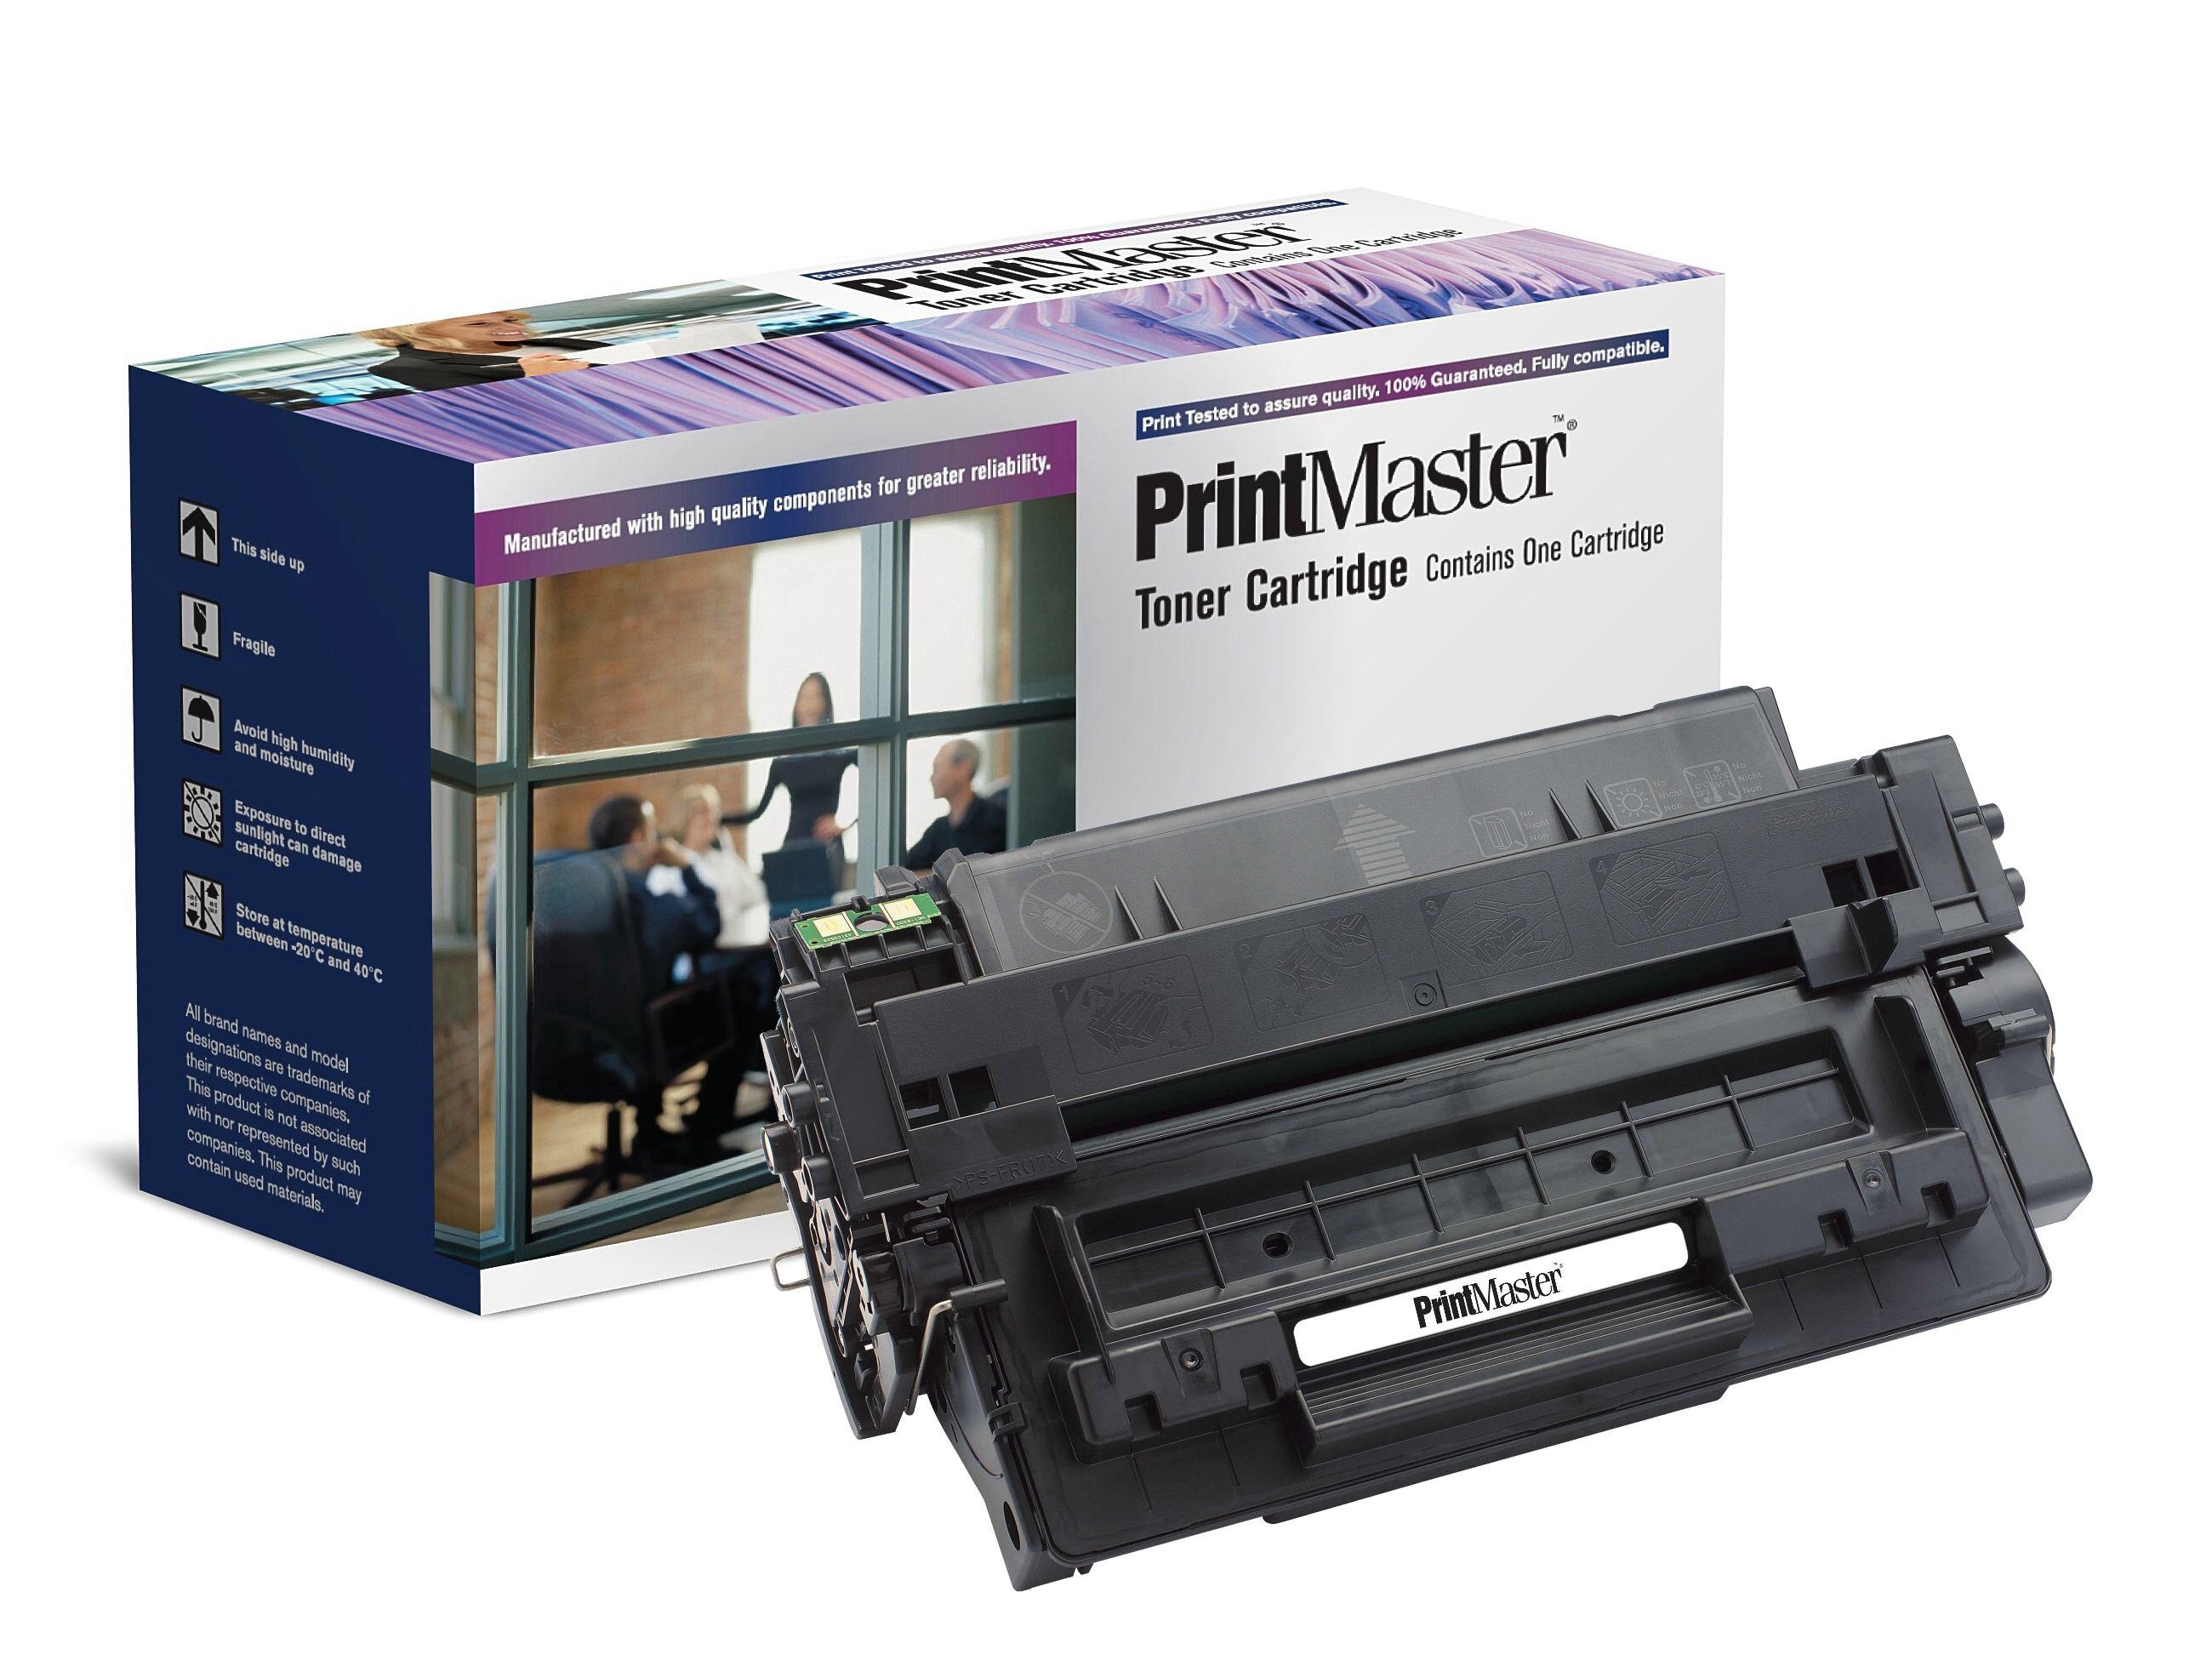 PrintMaster LJP3005 Black 6.5K Q7551A